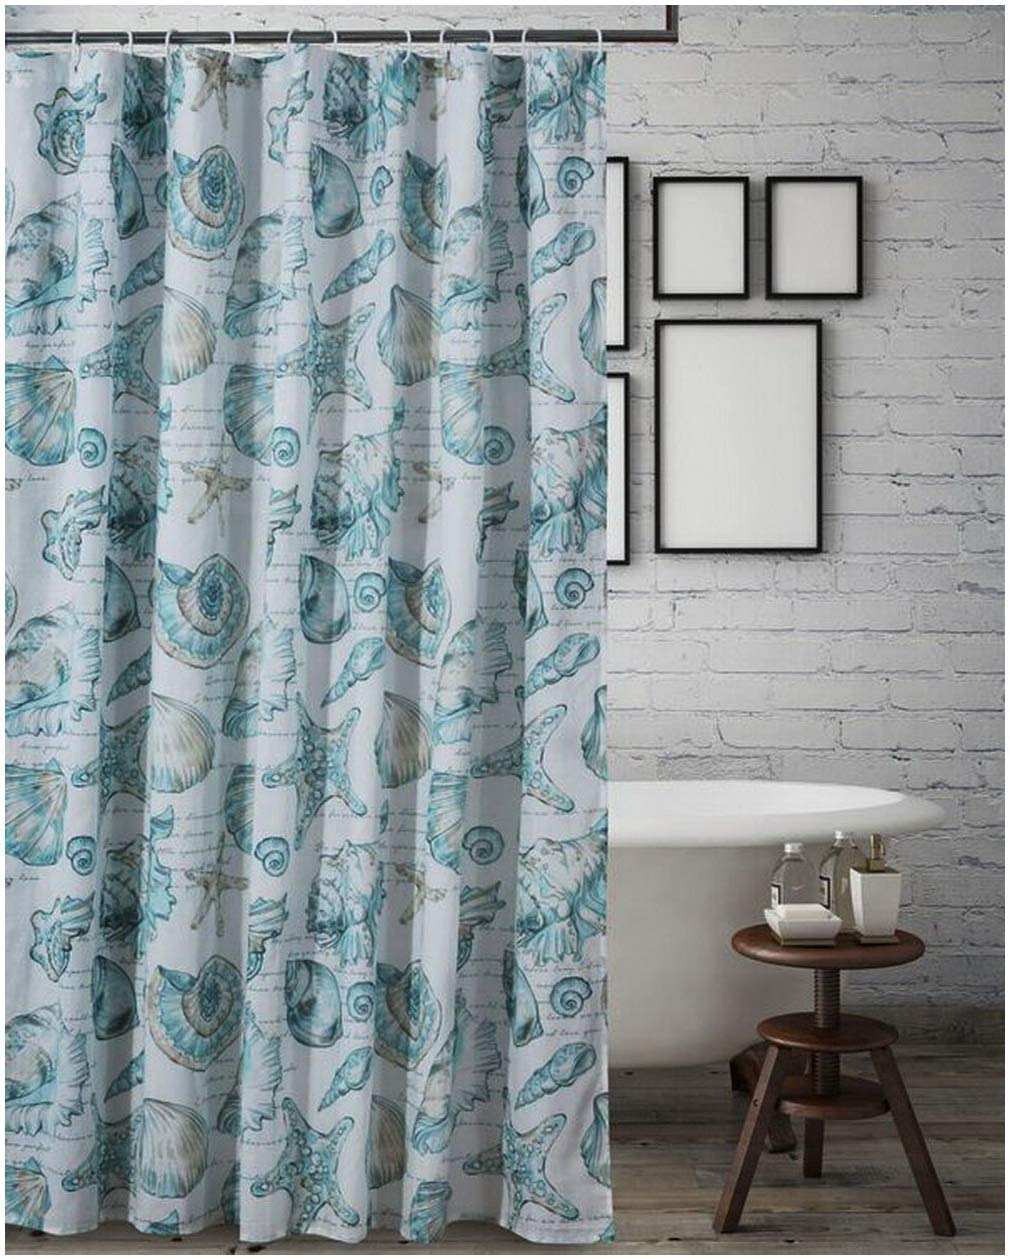 Buy Coastal Beach Fabric Shower Curtain With 12 Seashell